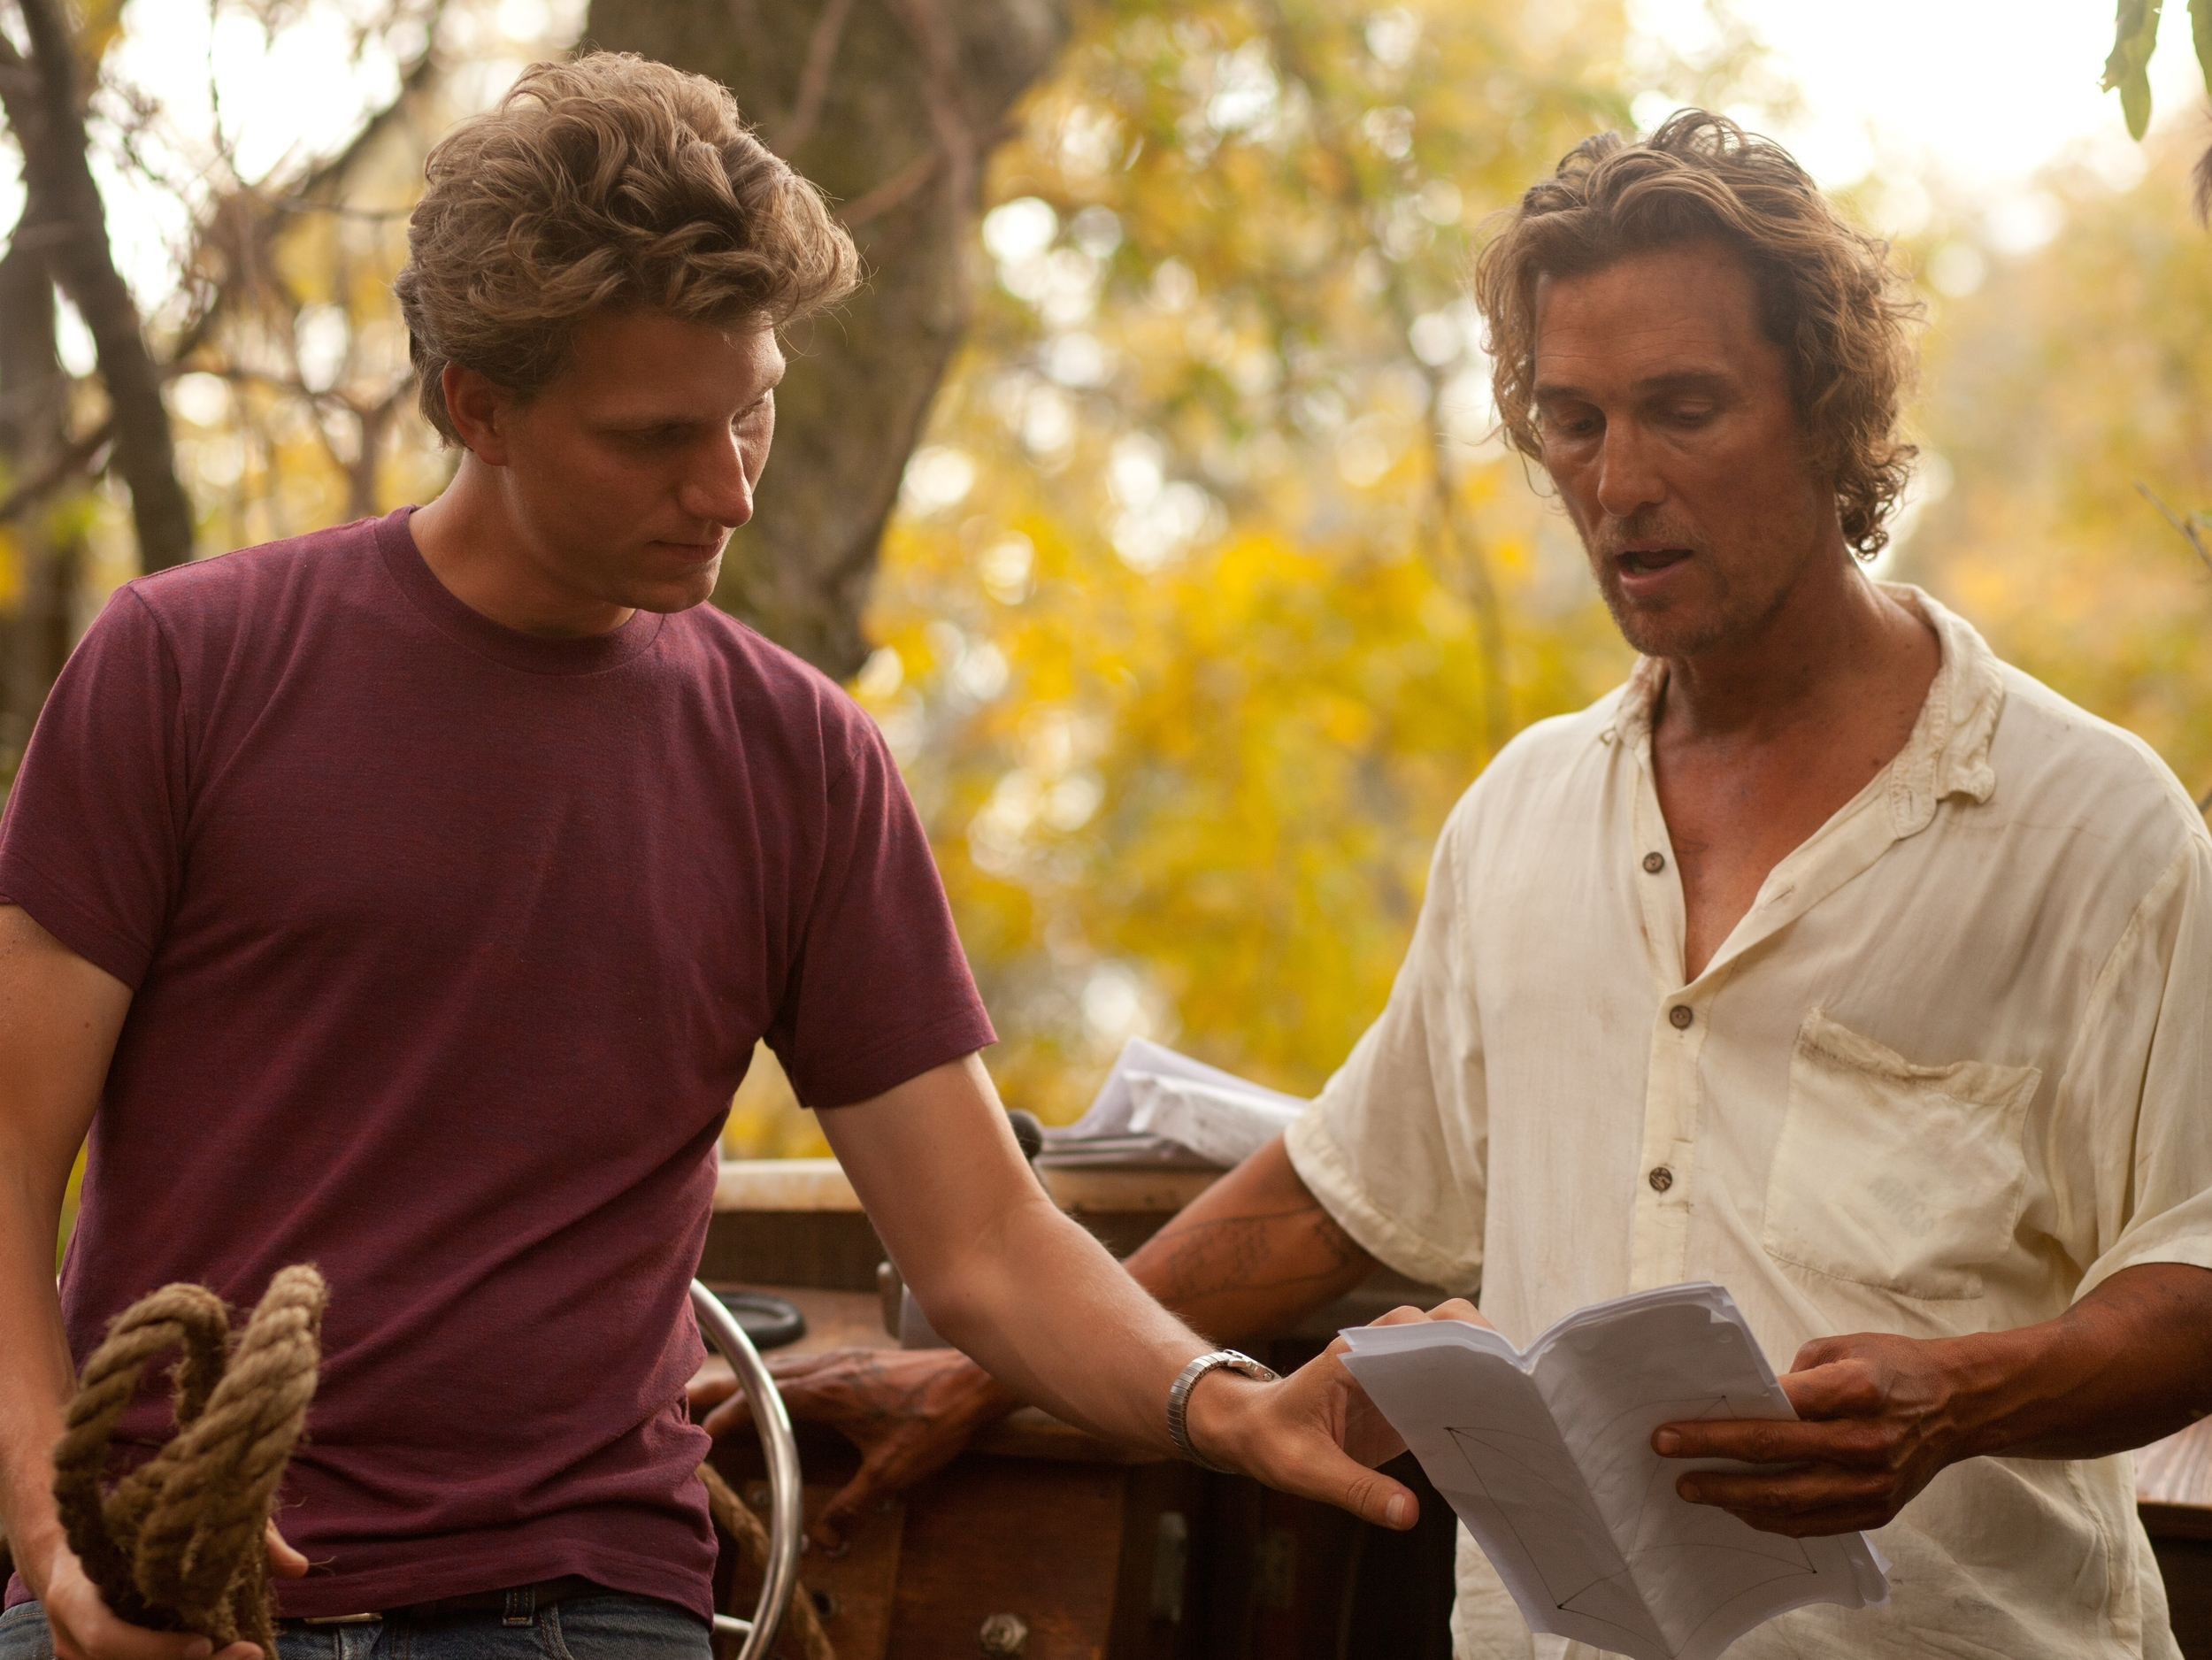 PHOTO CREDIT: Still of Jeff Nichols and Matthew McConaughey on the set of Mud.